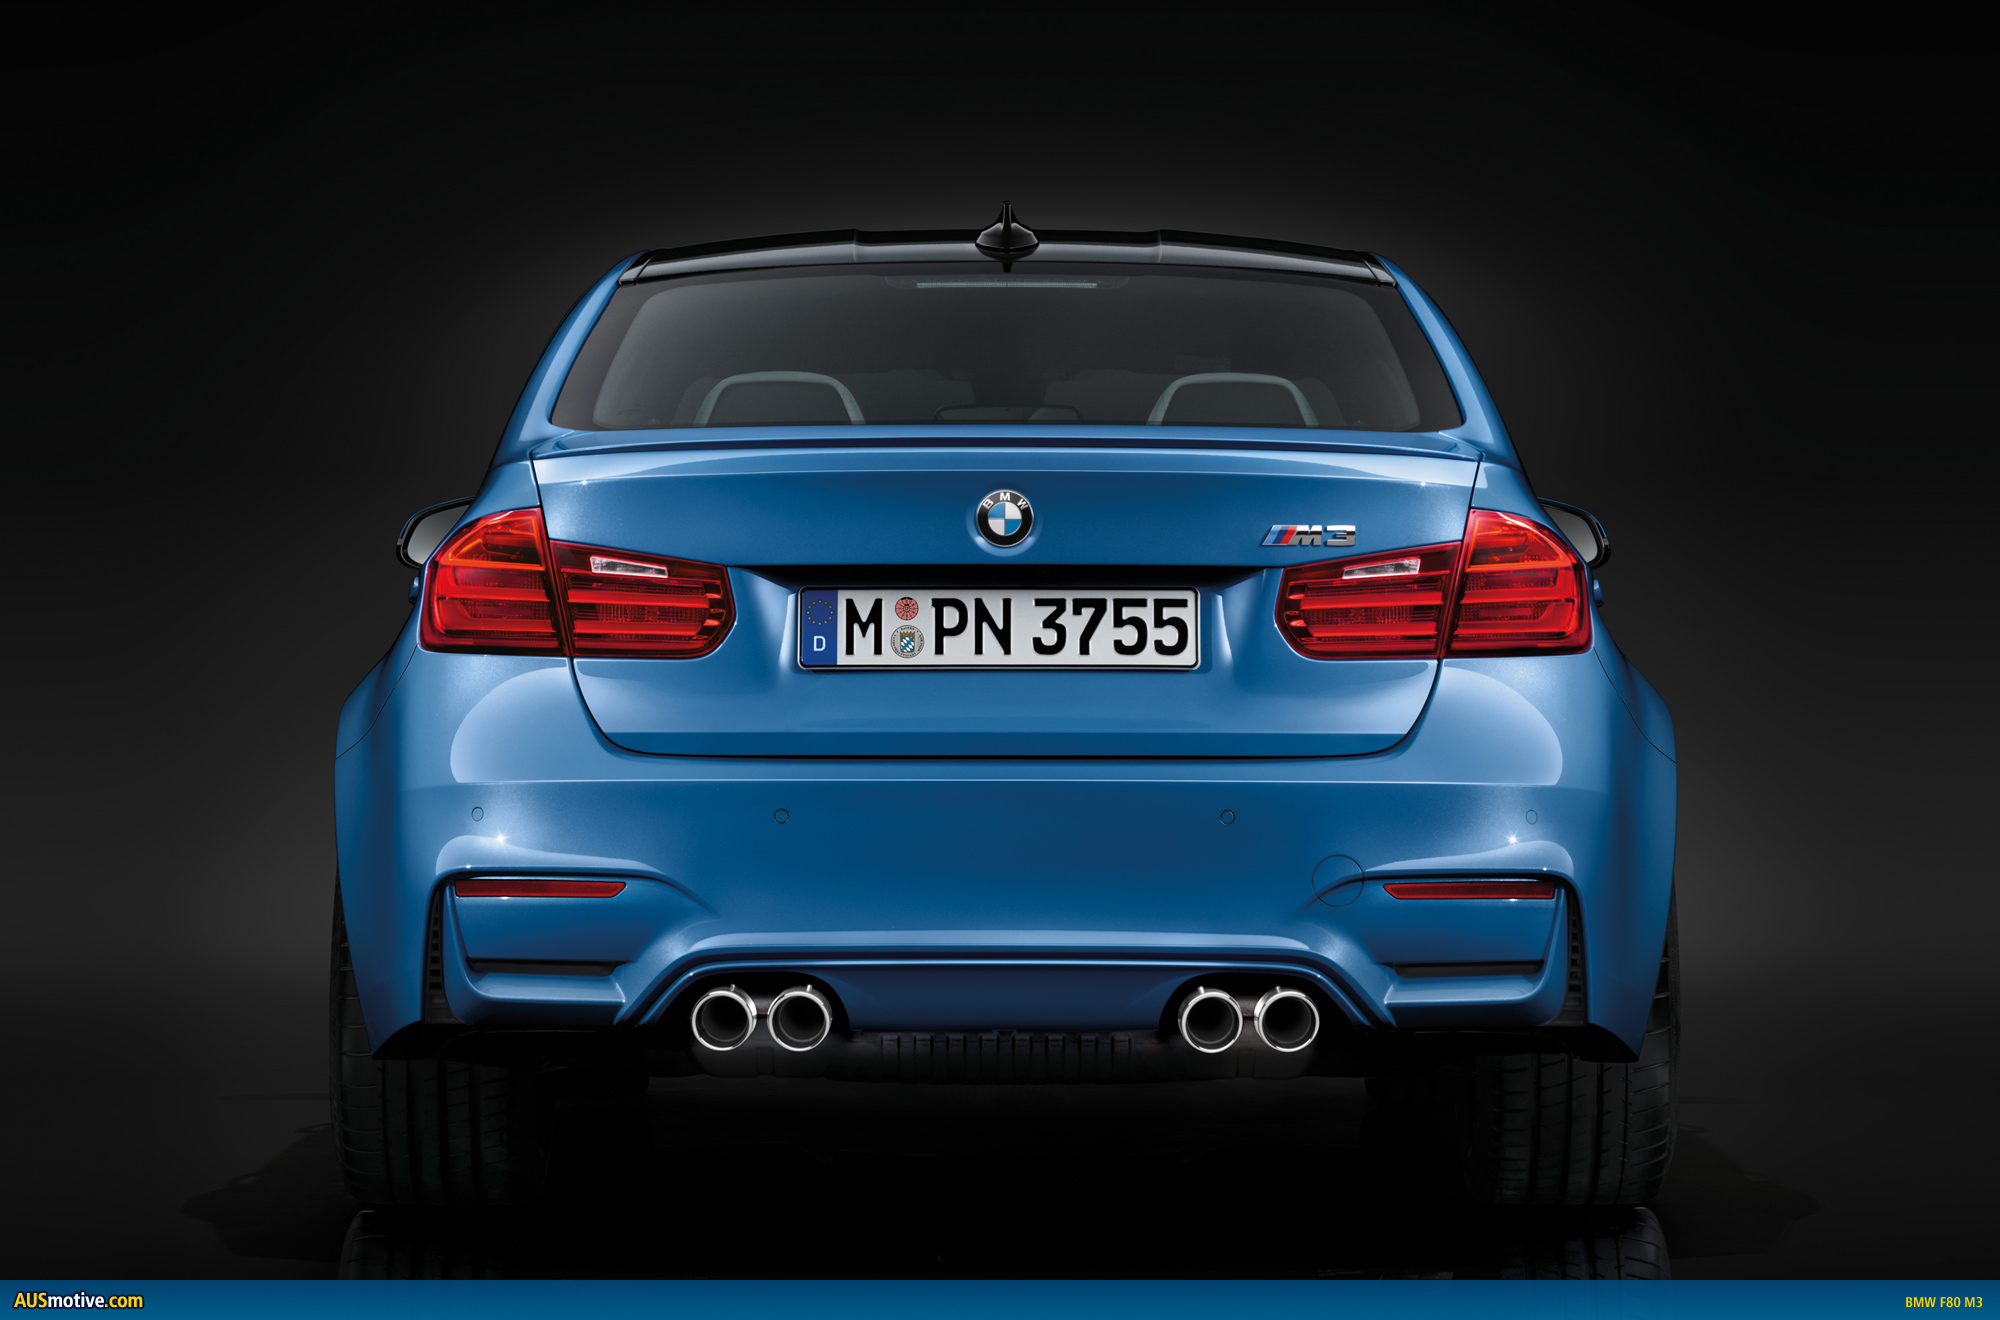 AUSmotive.com » 2014 BMW M3 Sedan and M4 Coupe revealed